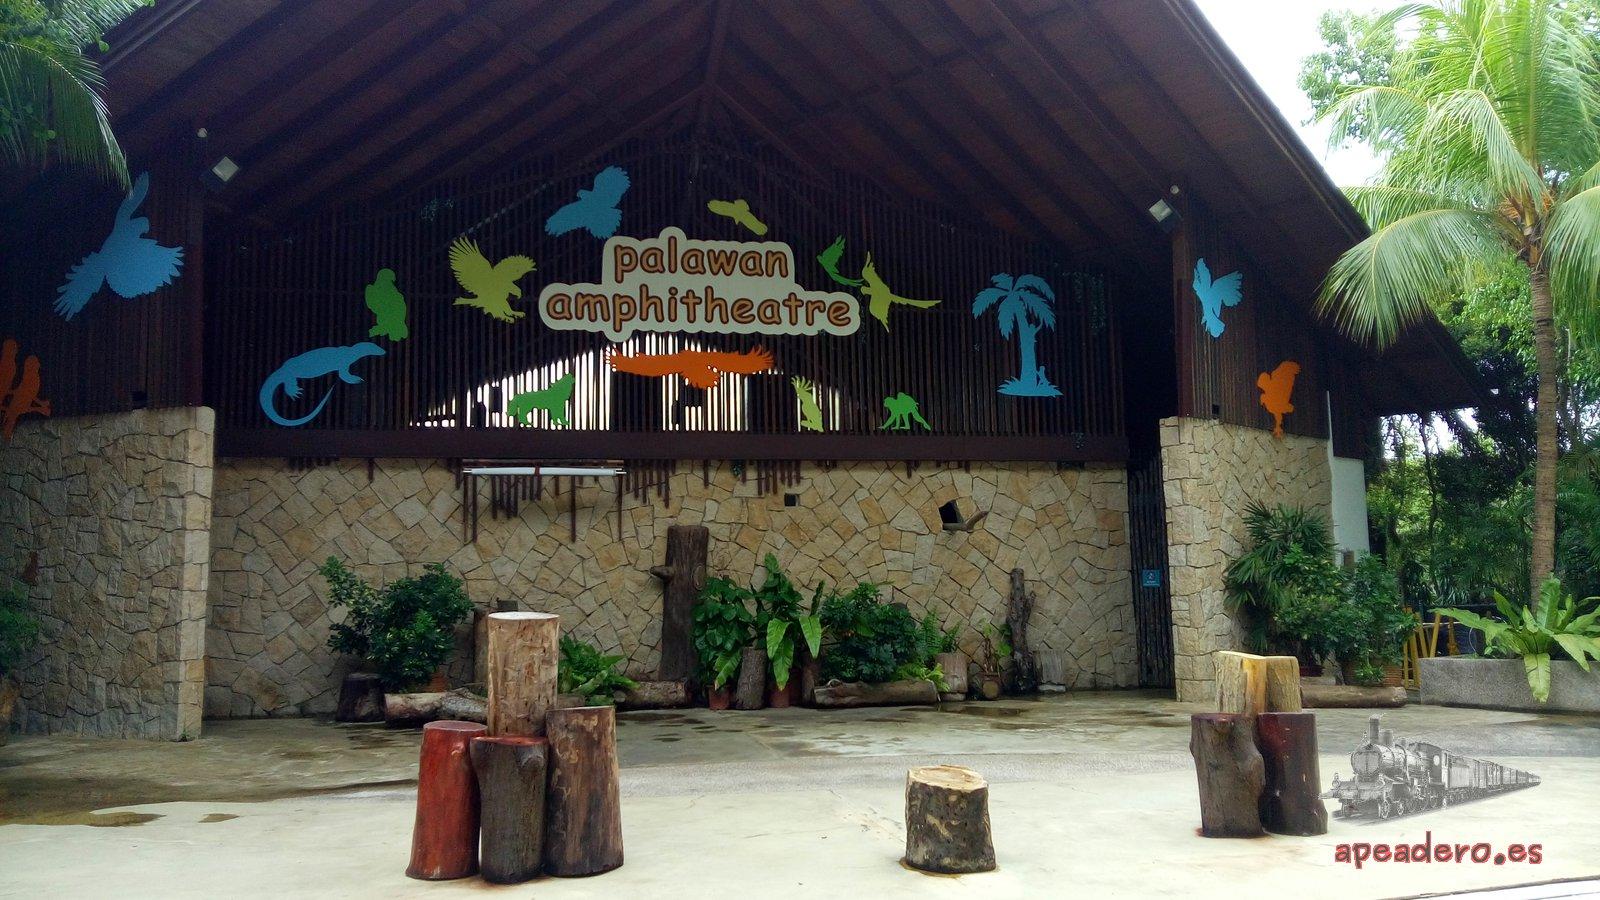 Anfiteatro de Palawan gratis en Singapur